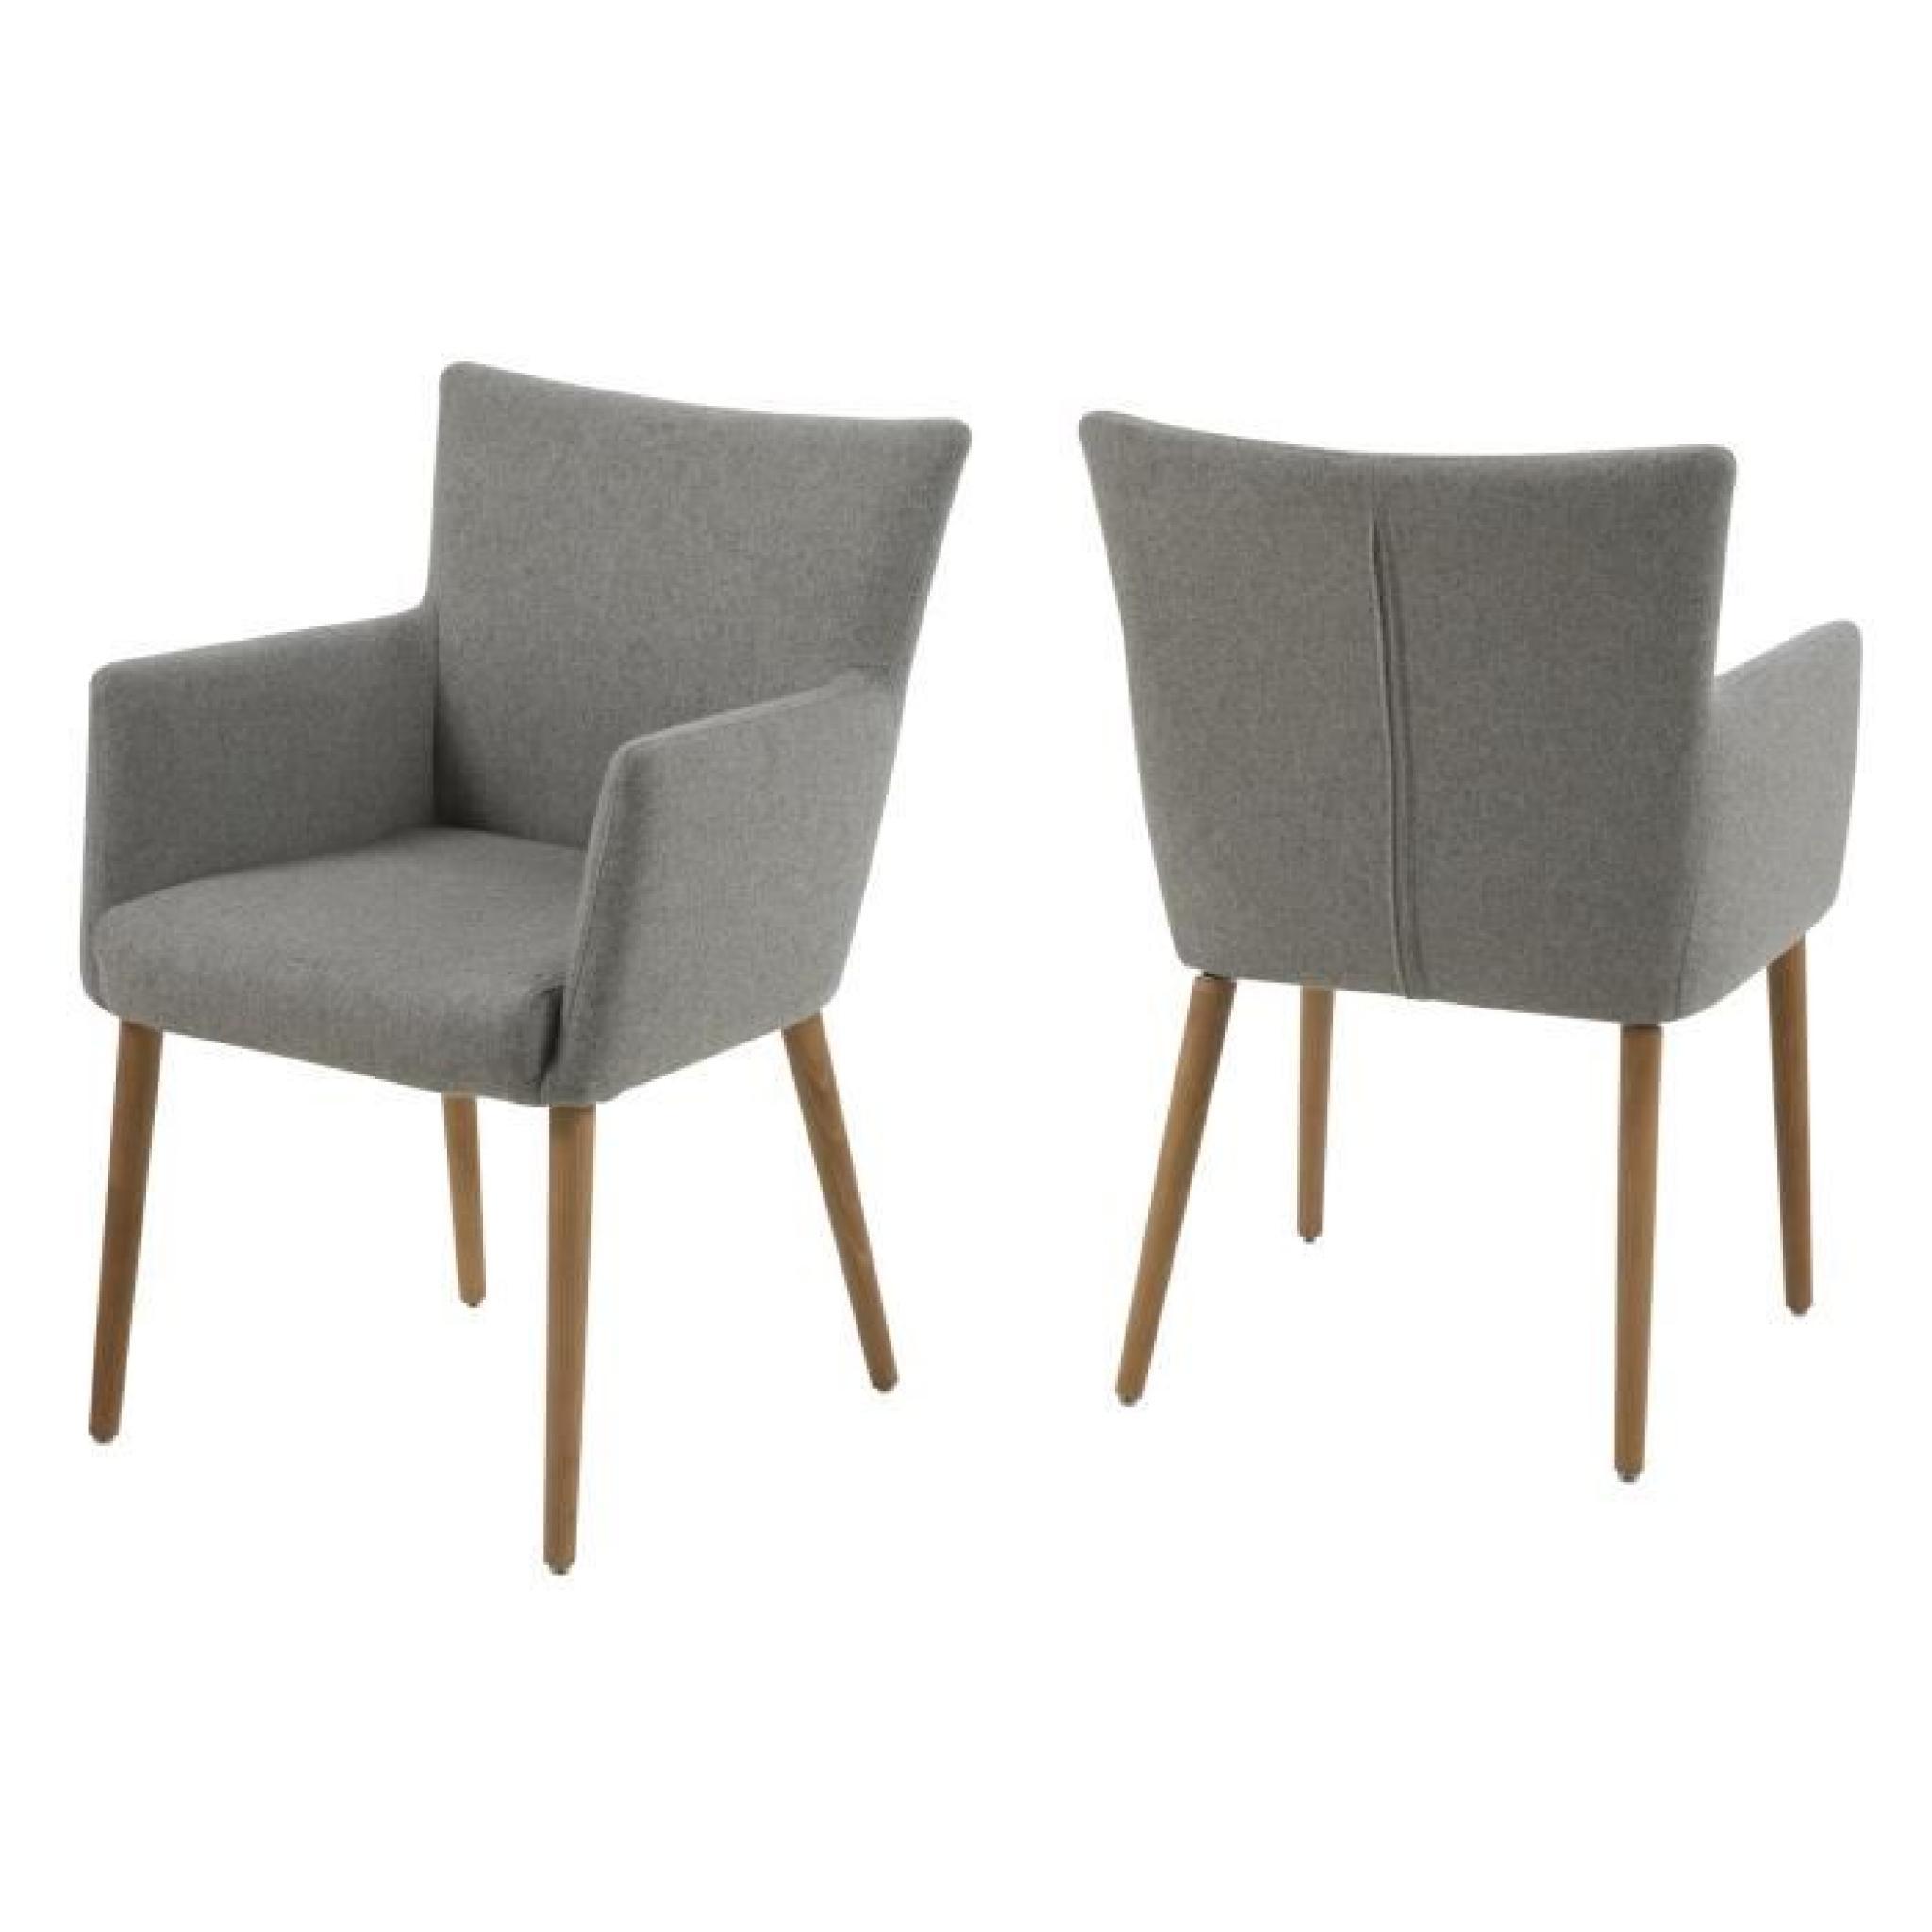 Chaise de salle manger nellie en tissu avec acco achat for Chaise salle a manger confortable